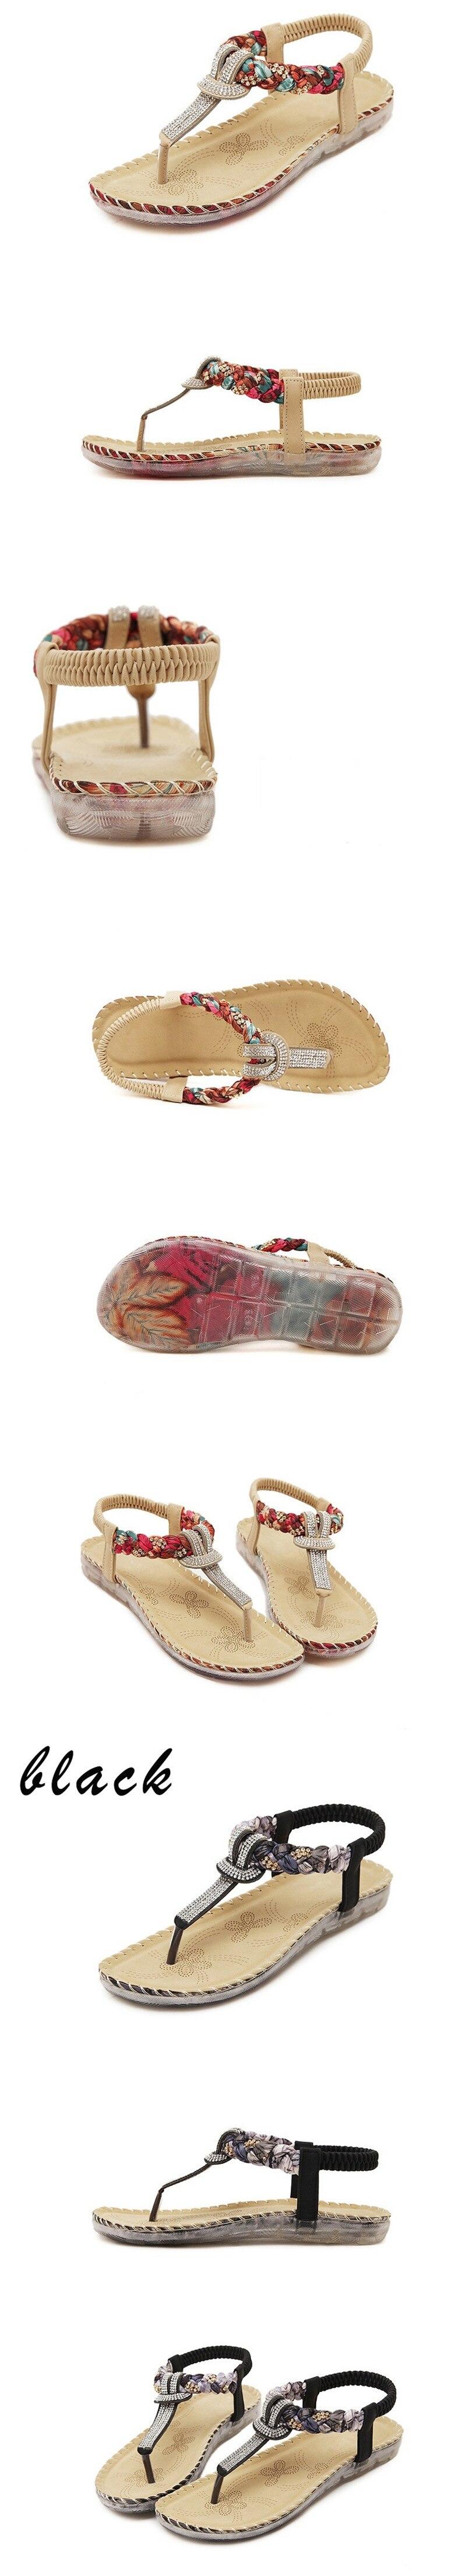 HTB1kSQAzaSWBuNjSsrbq6y0mVXaU TIMETANG Women Sandals Bohemia Women Casual Shoes Sexy Beach Summer Girls Flip Flops Gladiator Fashion Cute Women Flats Sandals